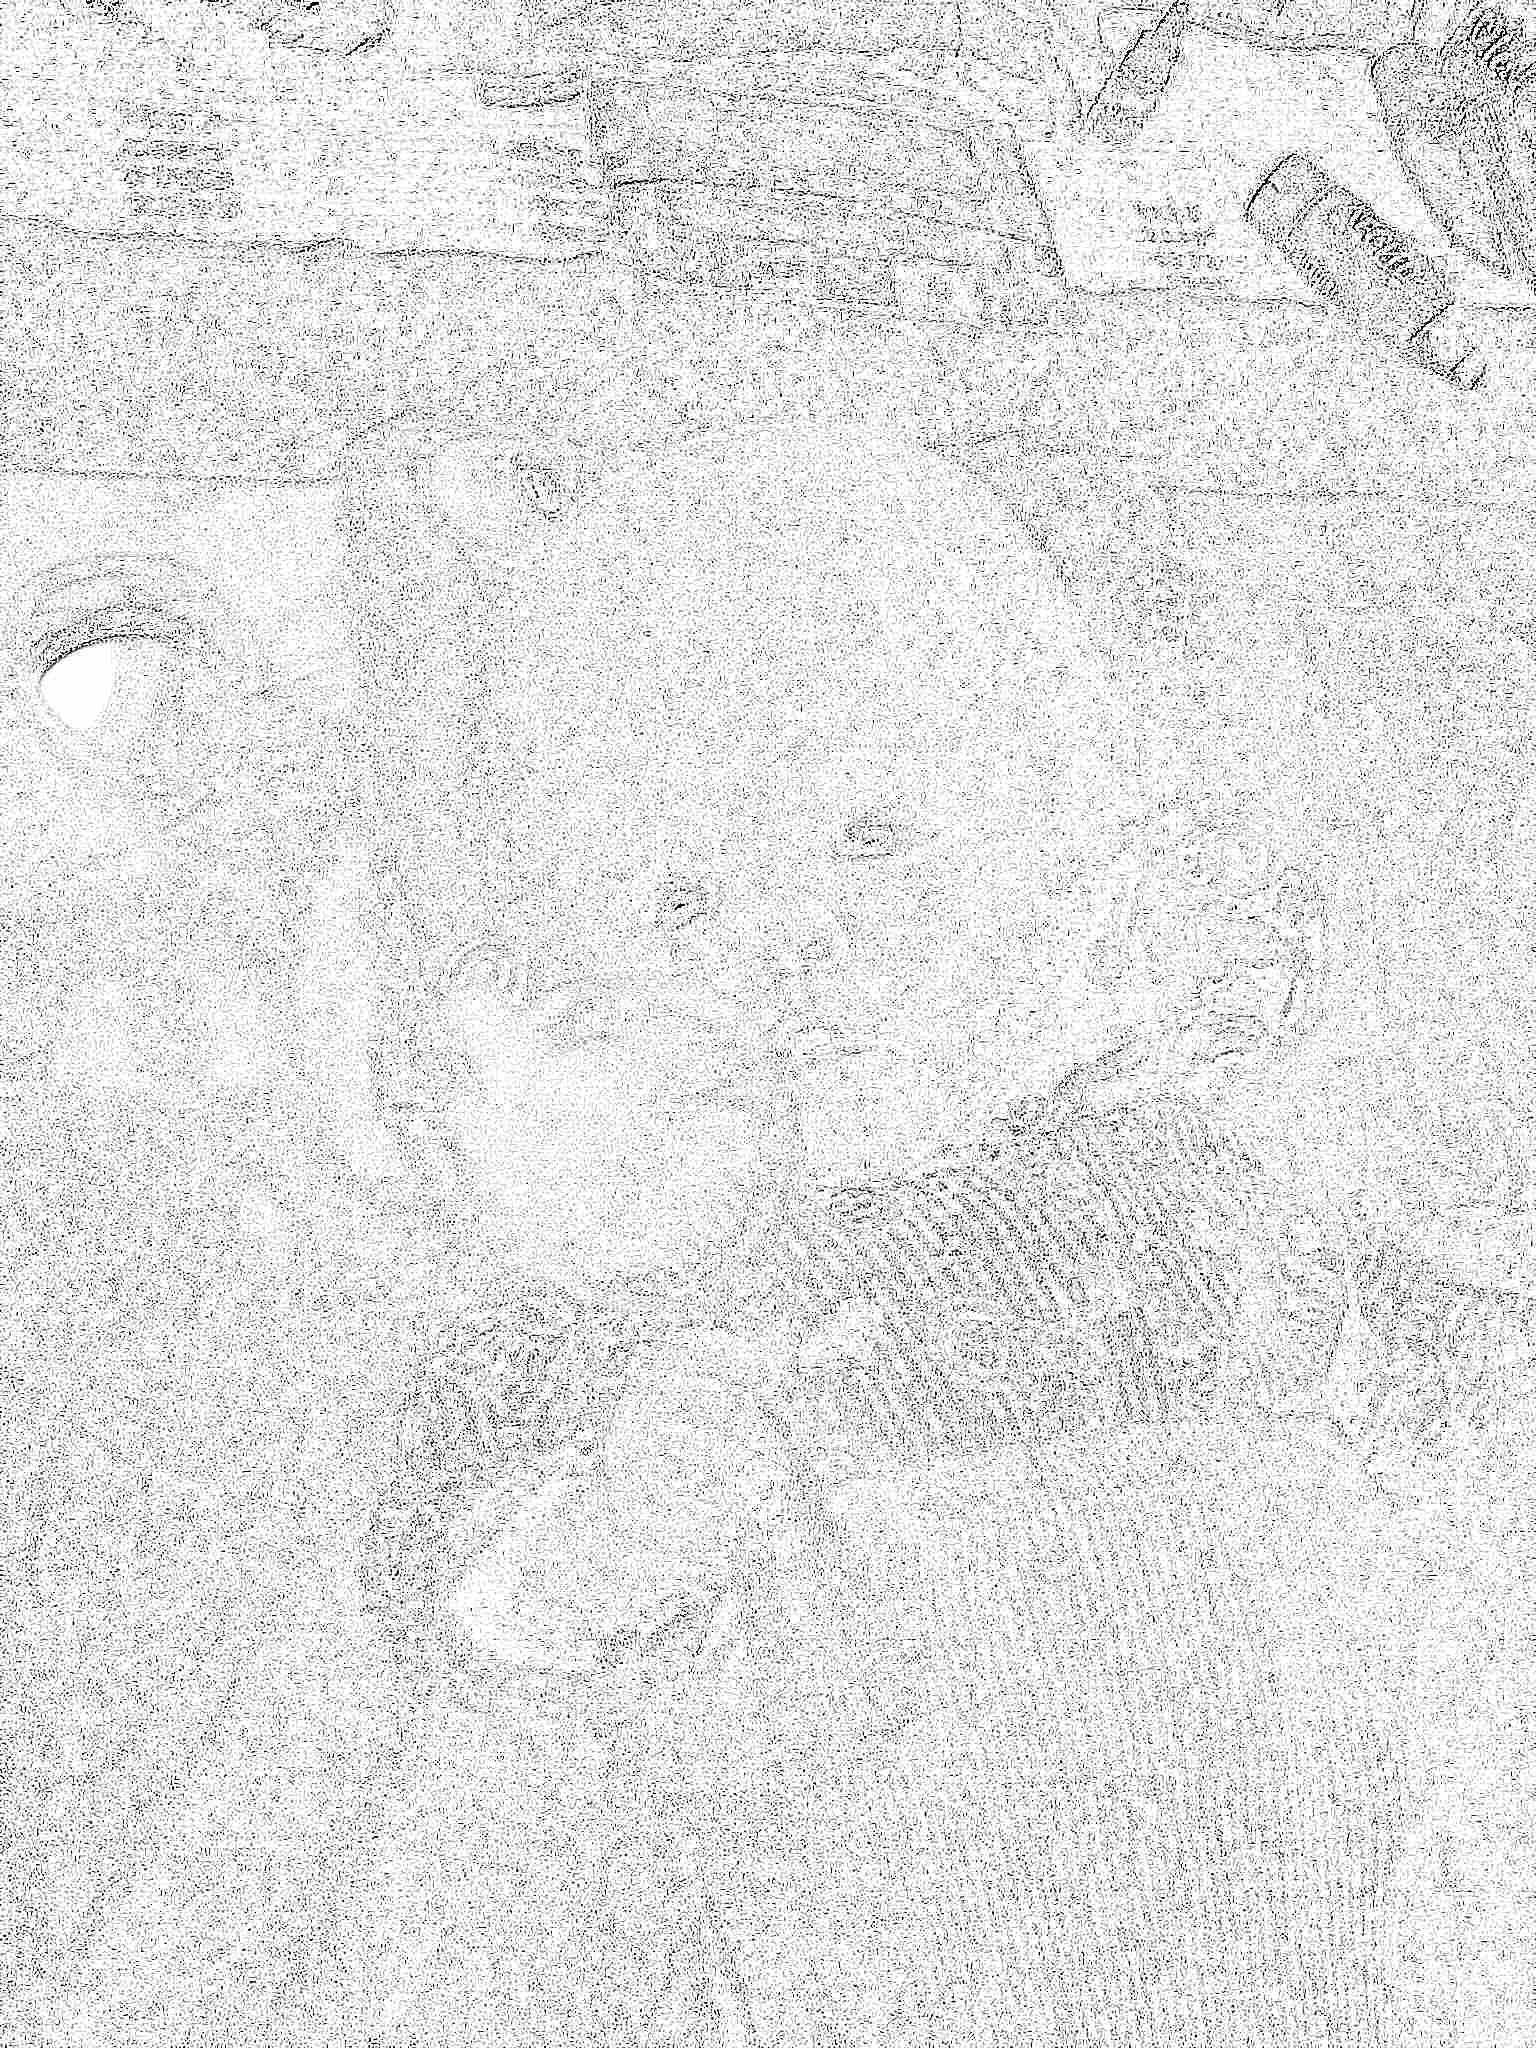 Малыш на приеме у невролога. Форма и размер черепа